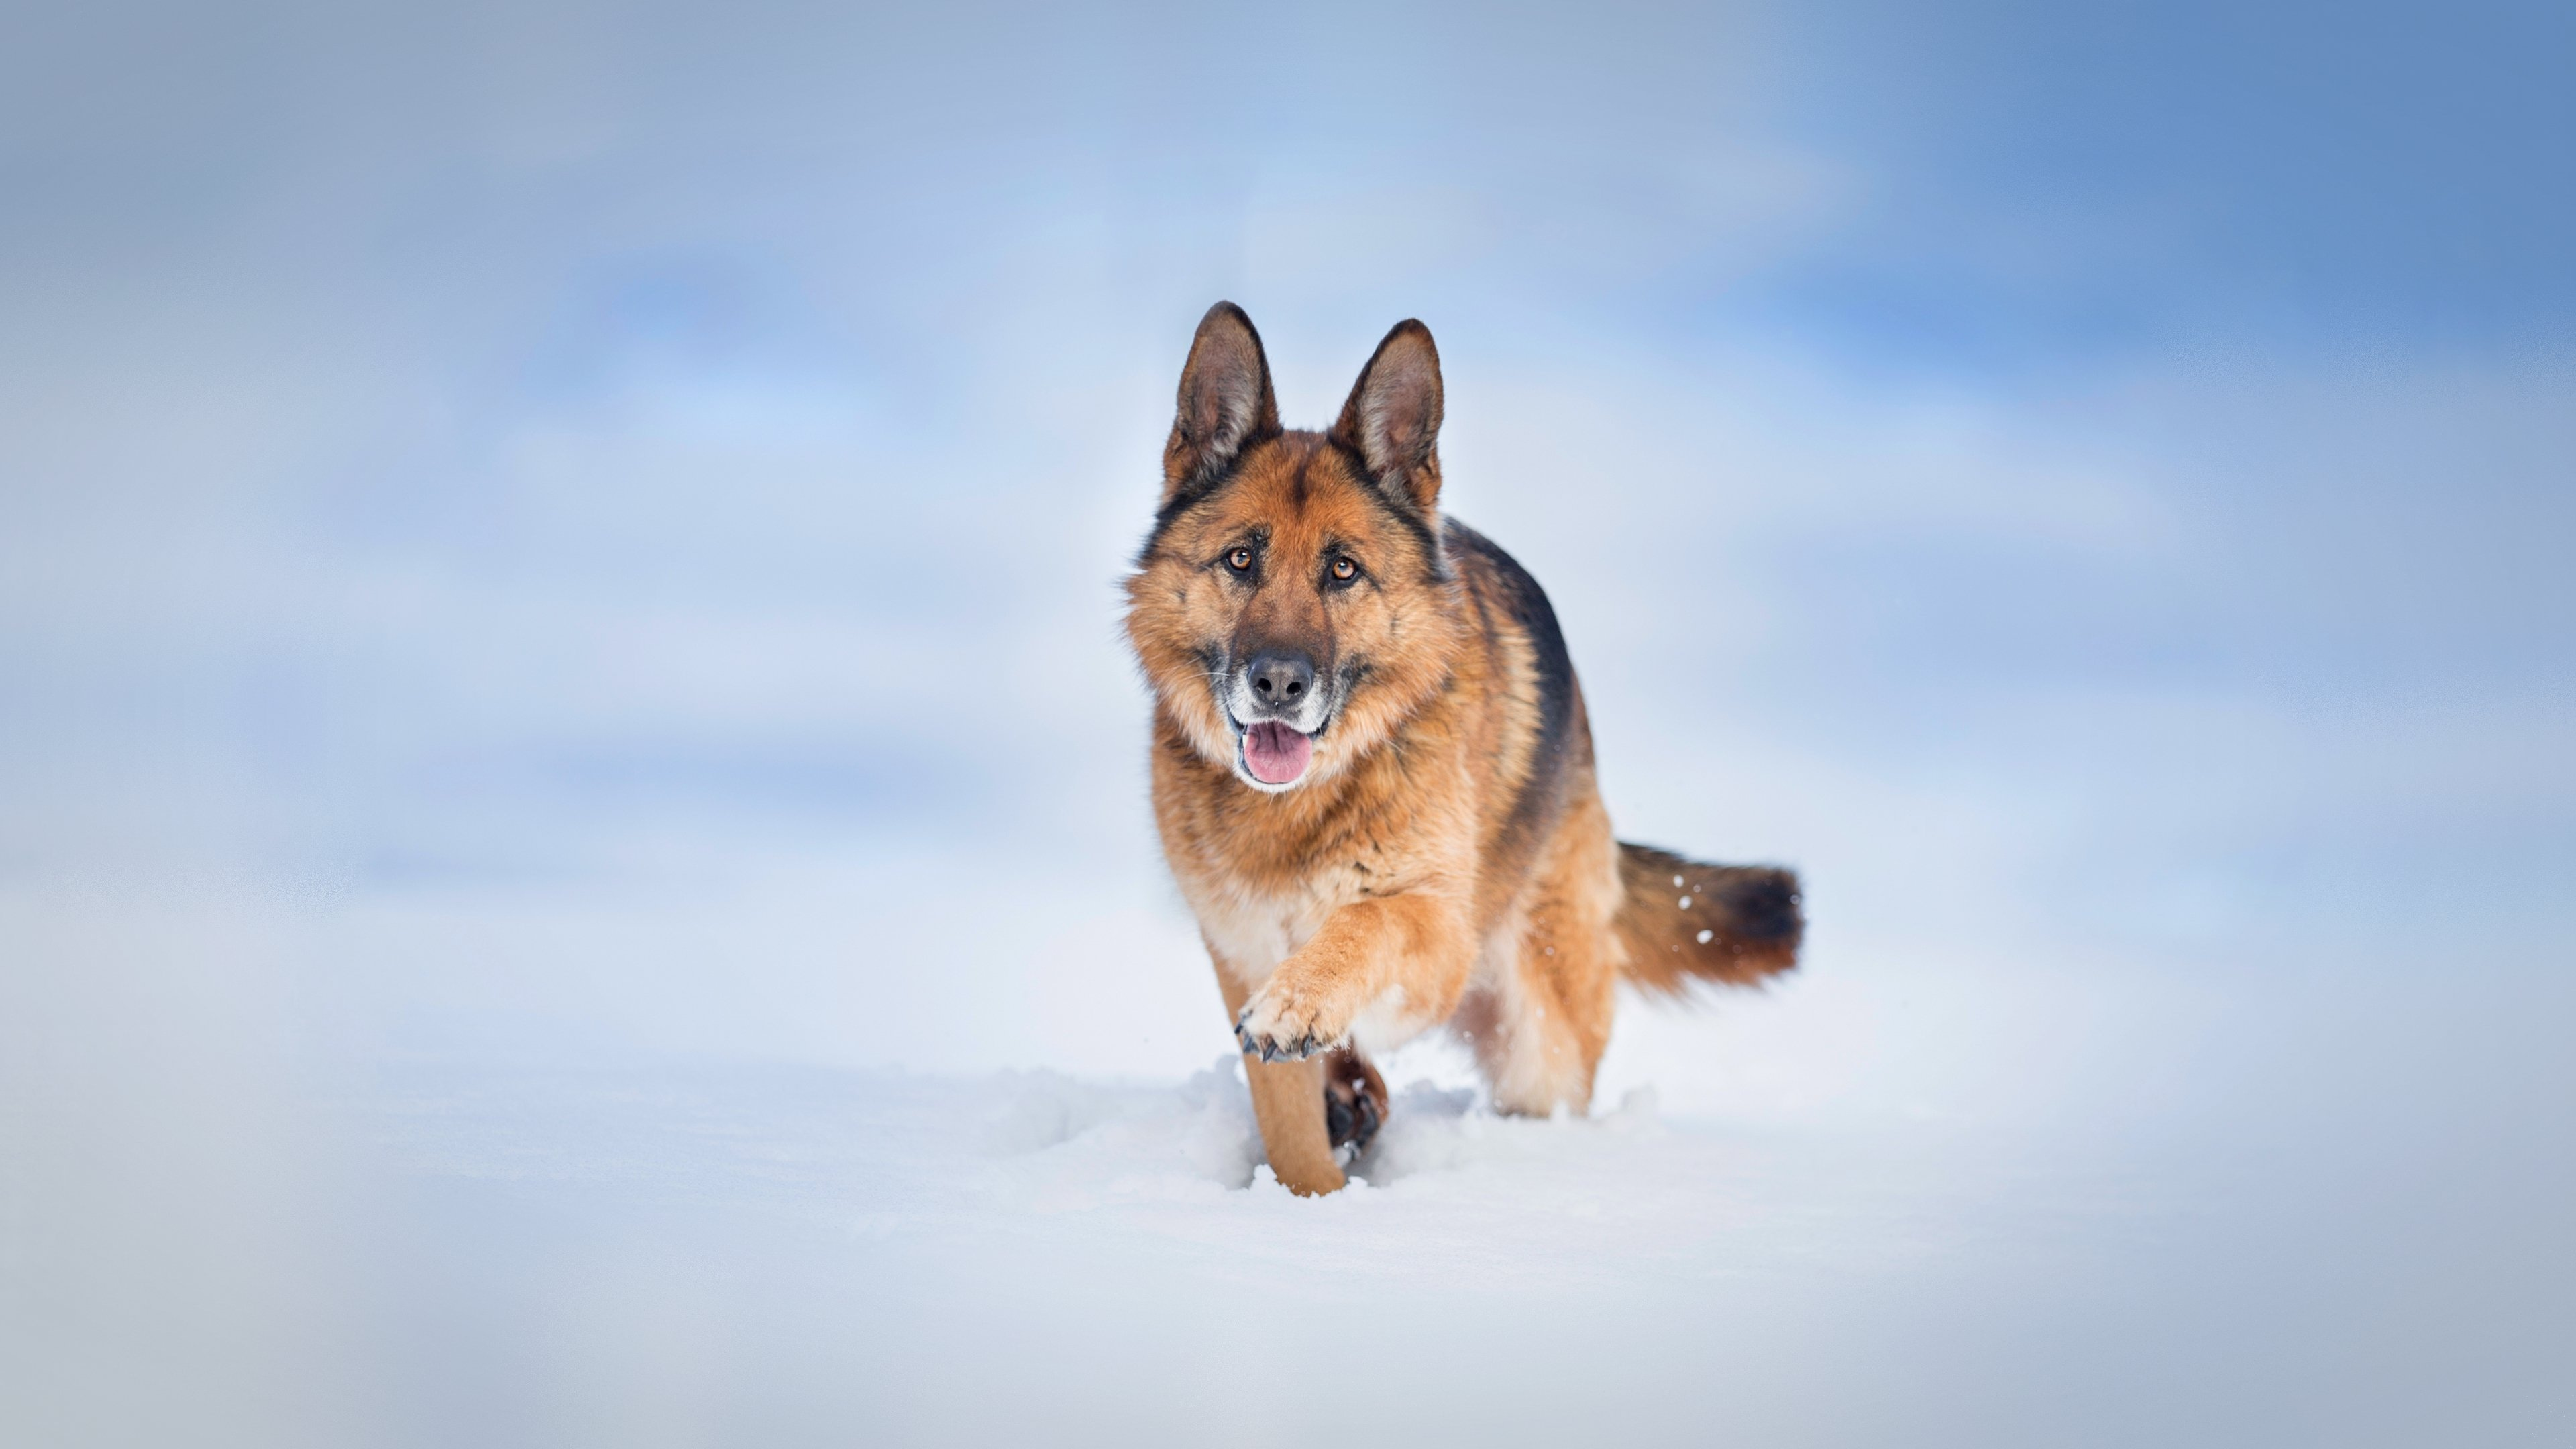 German Shepherd Dog 4K wallpaper